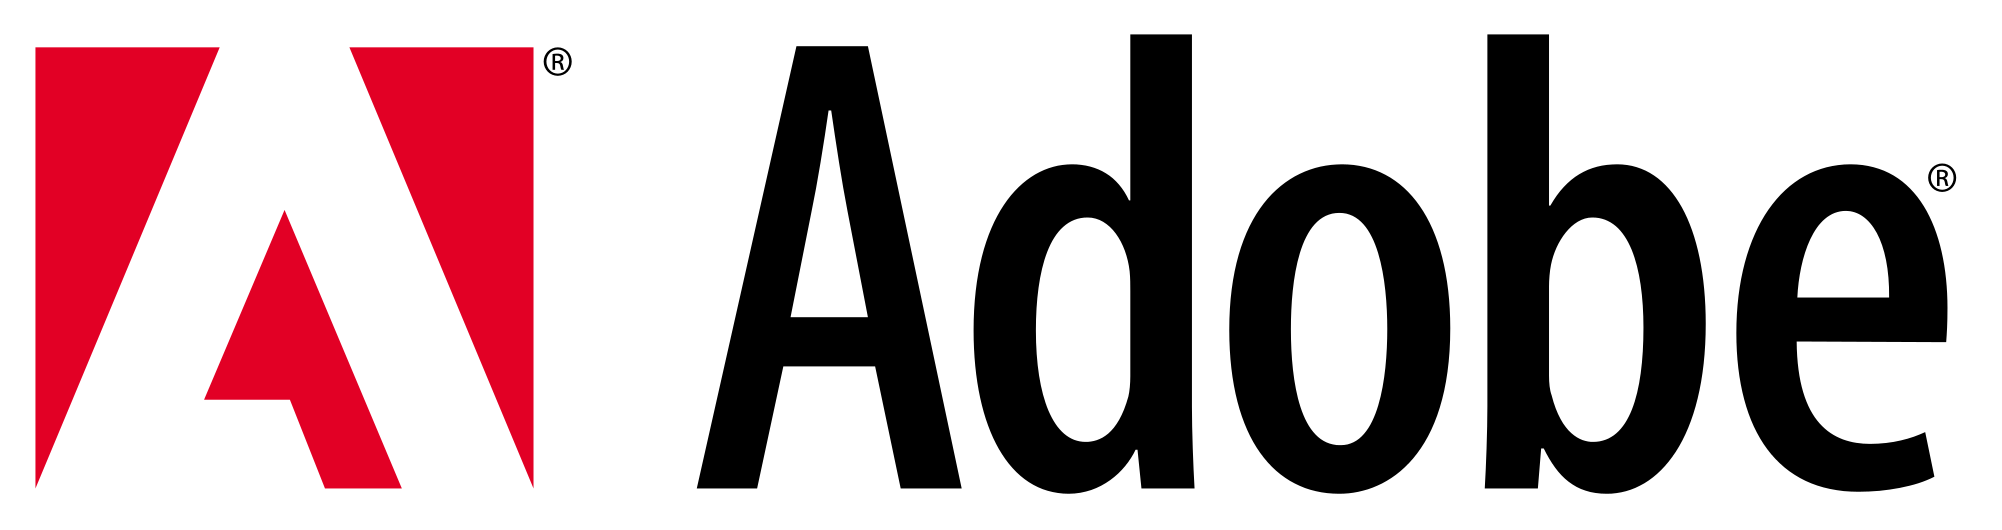 Adobe Experience Manager Ecommerce logo